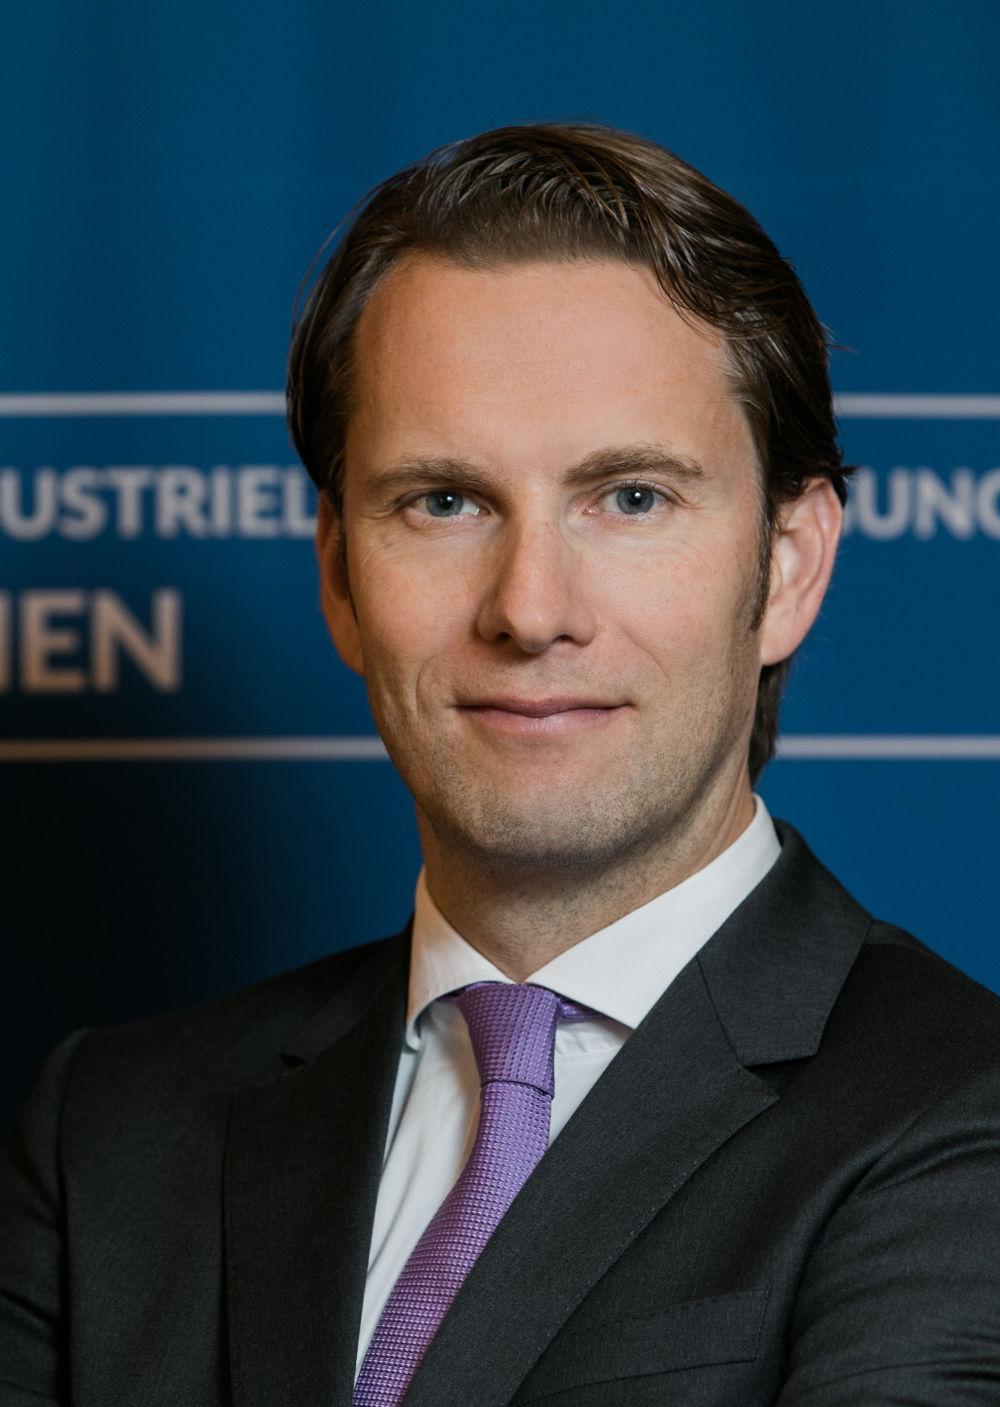 Johannes Höhrhan